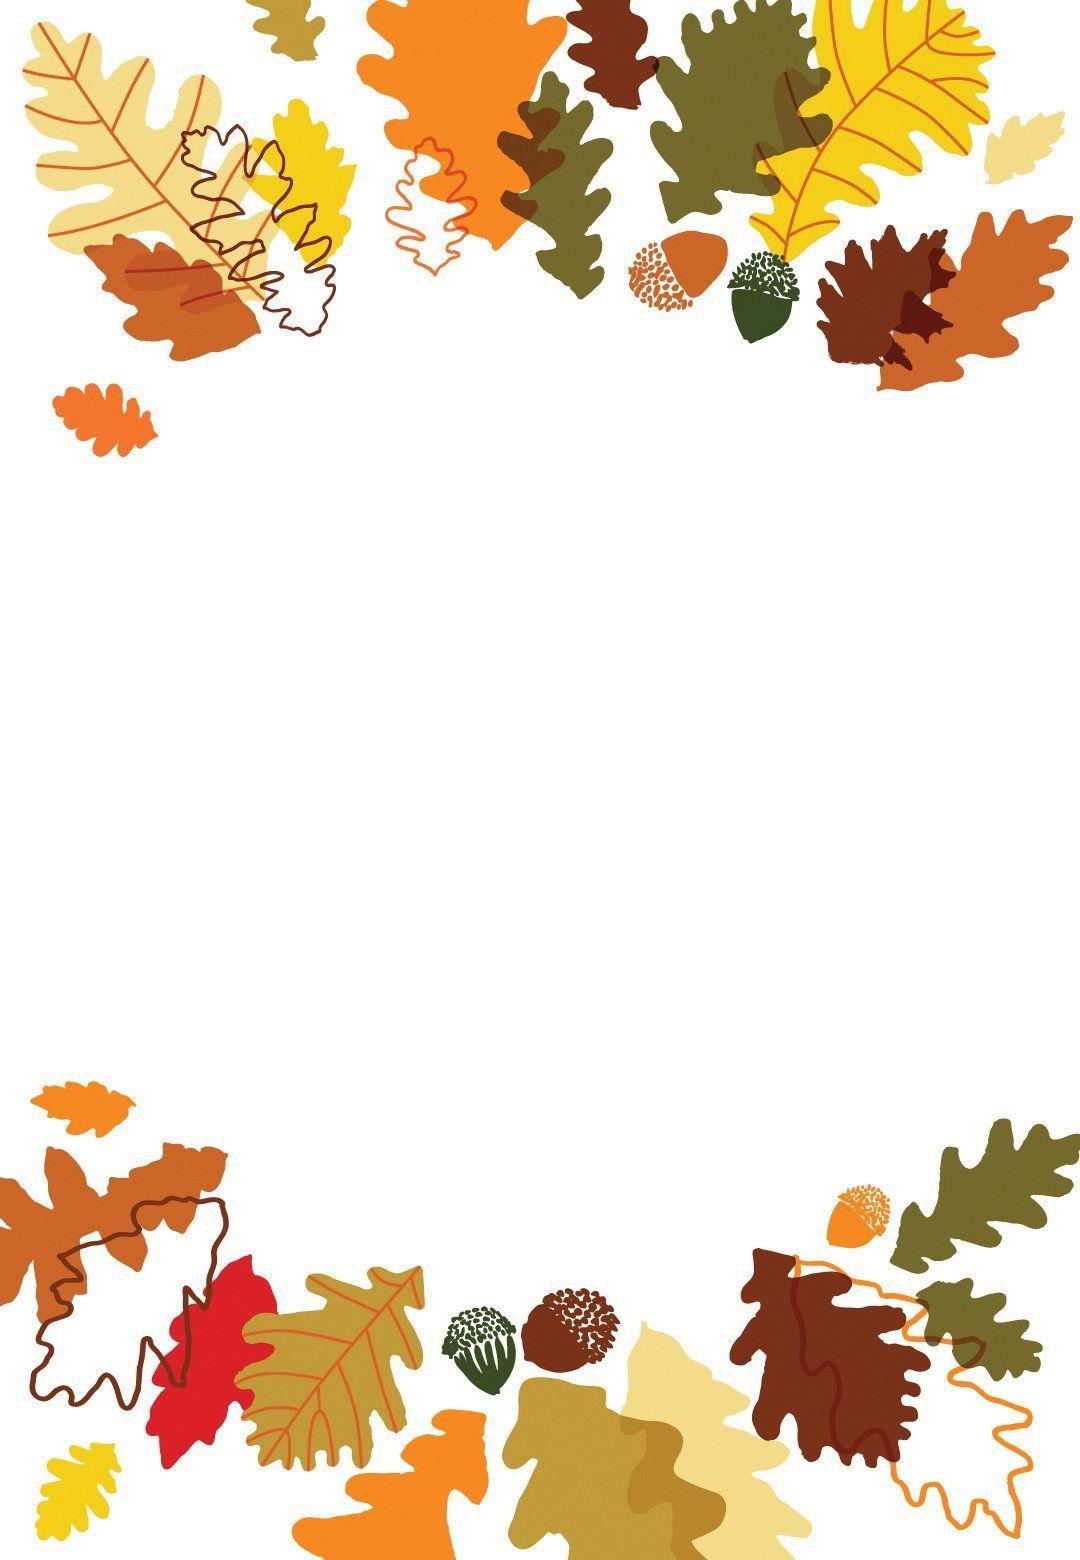 005 Formidable Free Thanksgiving Invitation Template Idea  Templates Printable Dinner Download PotluckFull